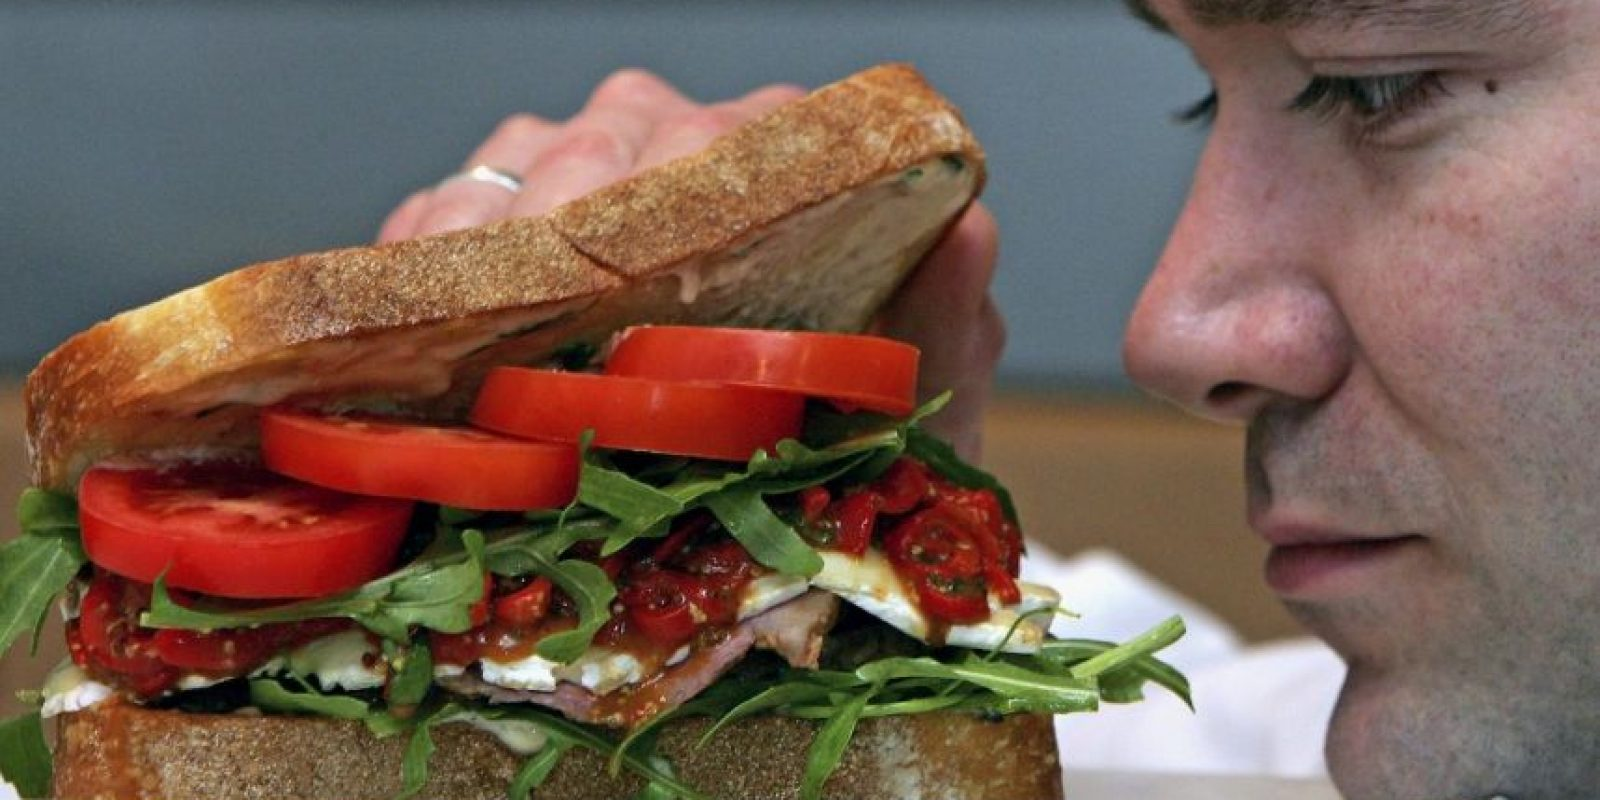 El comedor secreto Foto:Getty Images